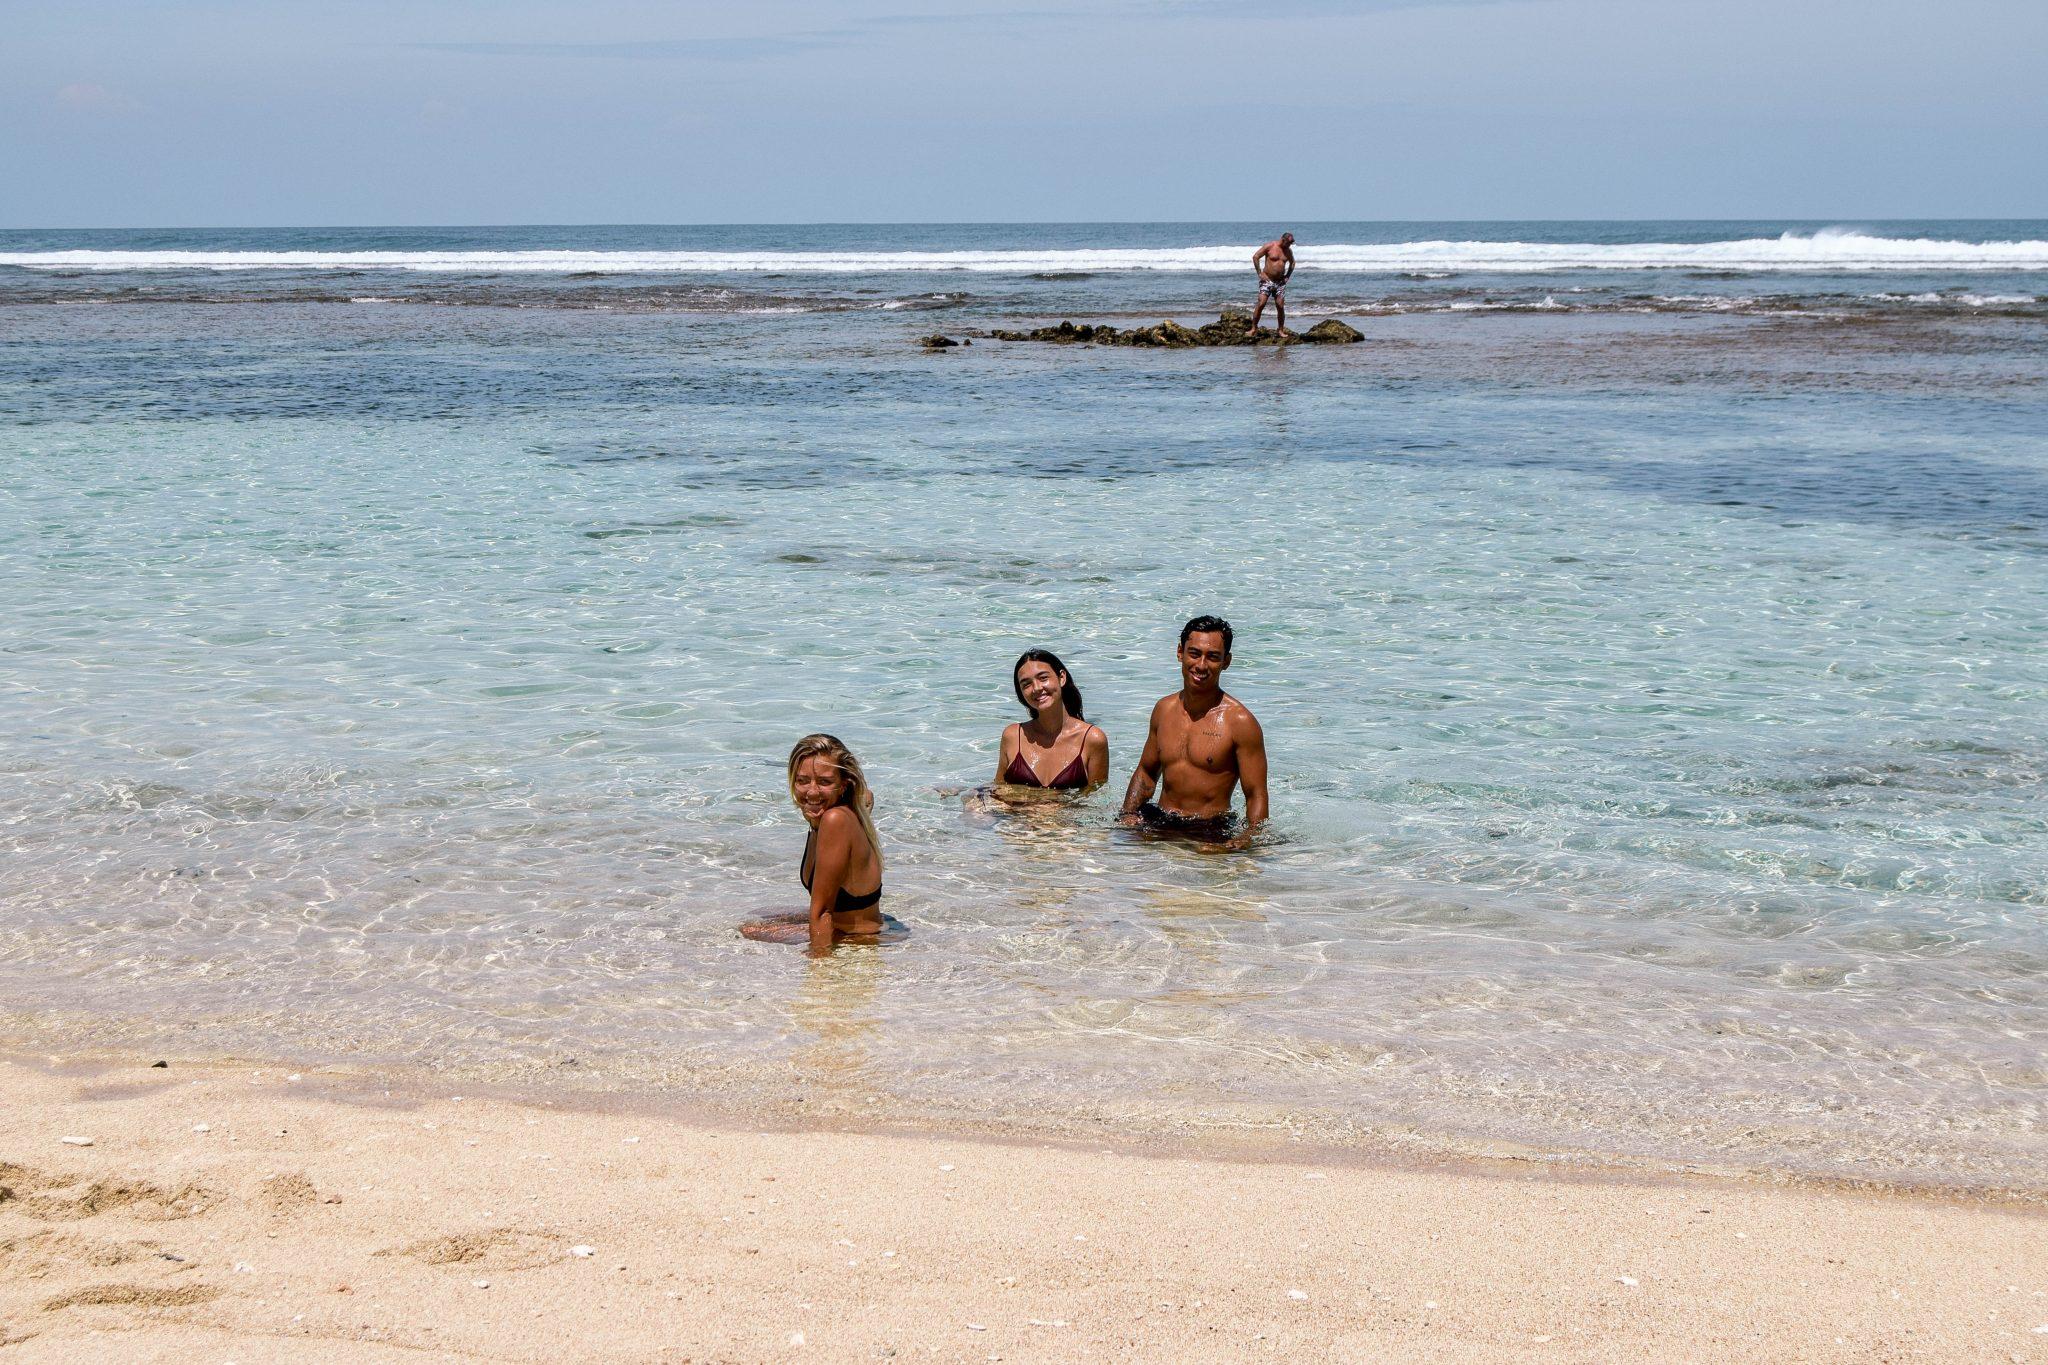 Wanderers & Warriors - Charlie & Lauren UK Travel Couple - Melasti Beach Bali – Our Best Beach In Bali - best bali beaches - best beach in bali - Uluwatu beaches - Uluwatu beach